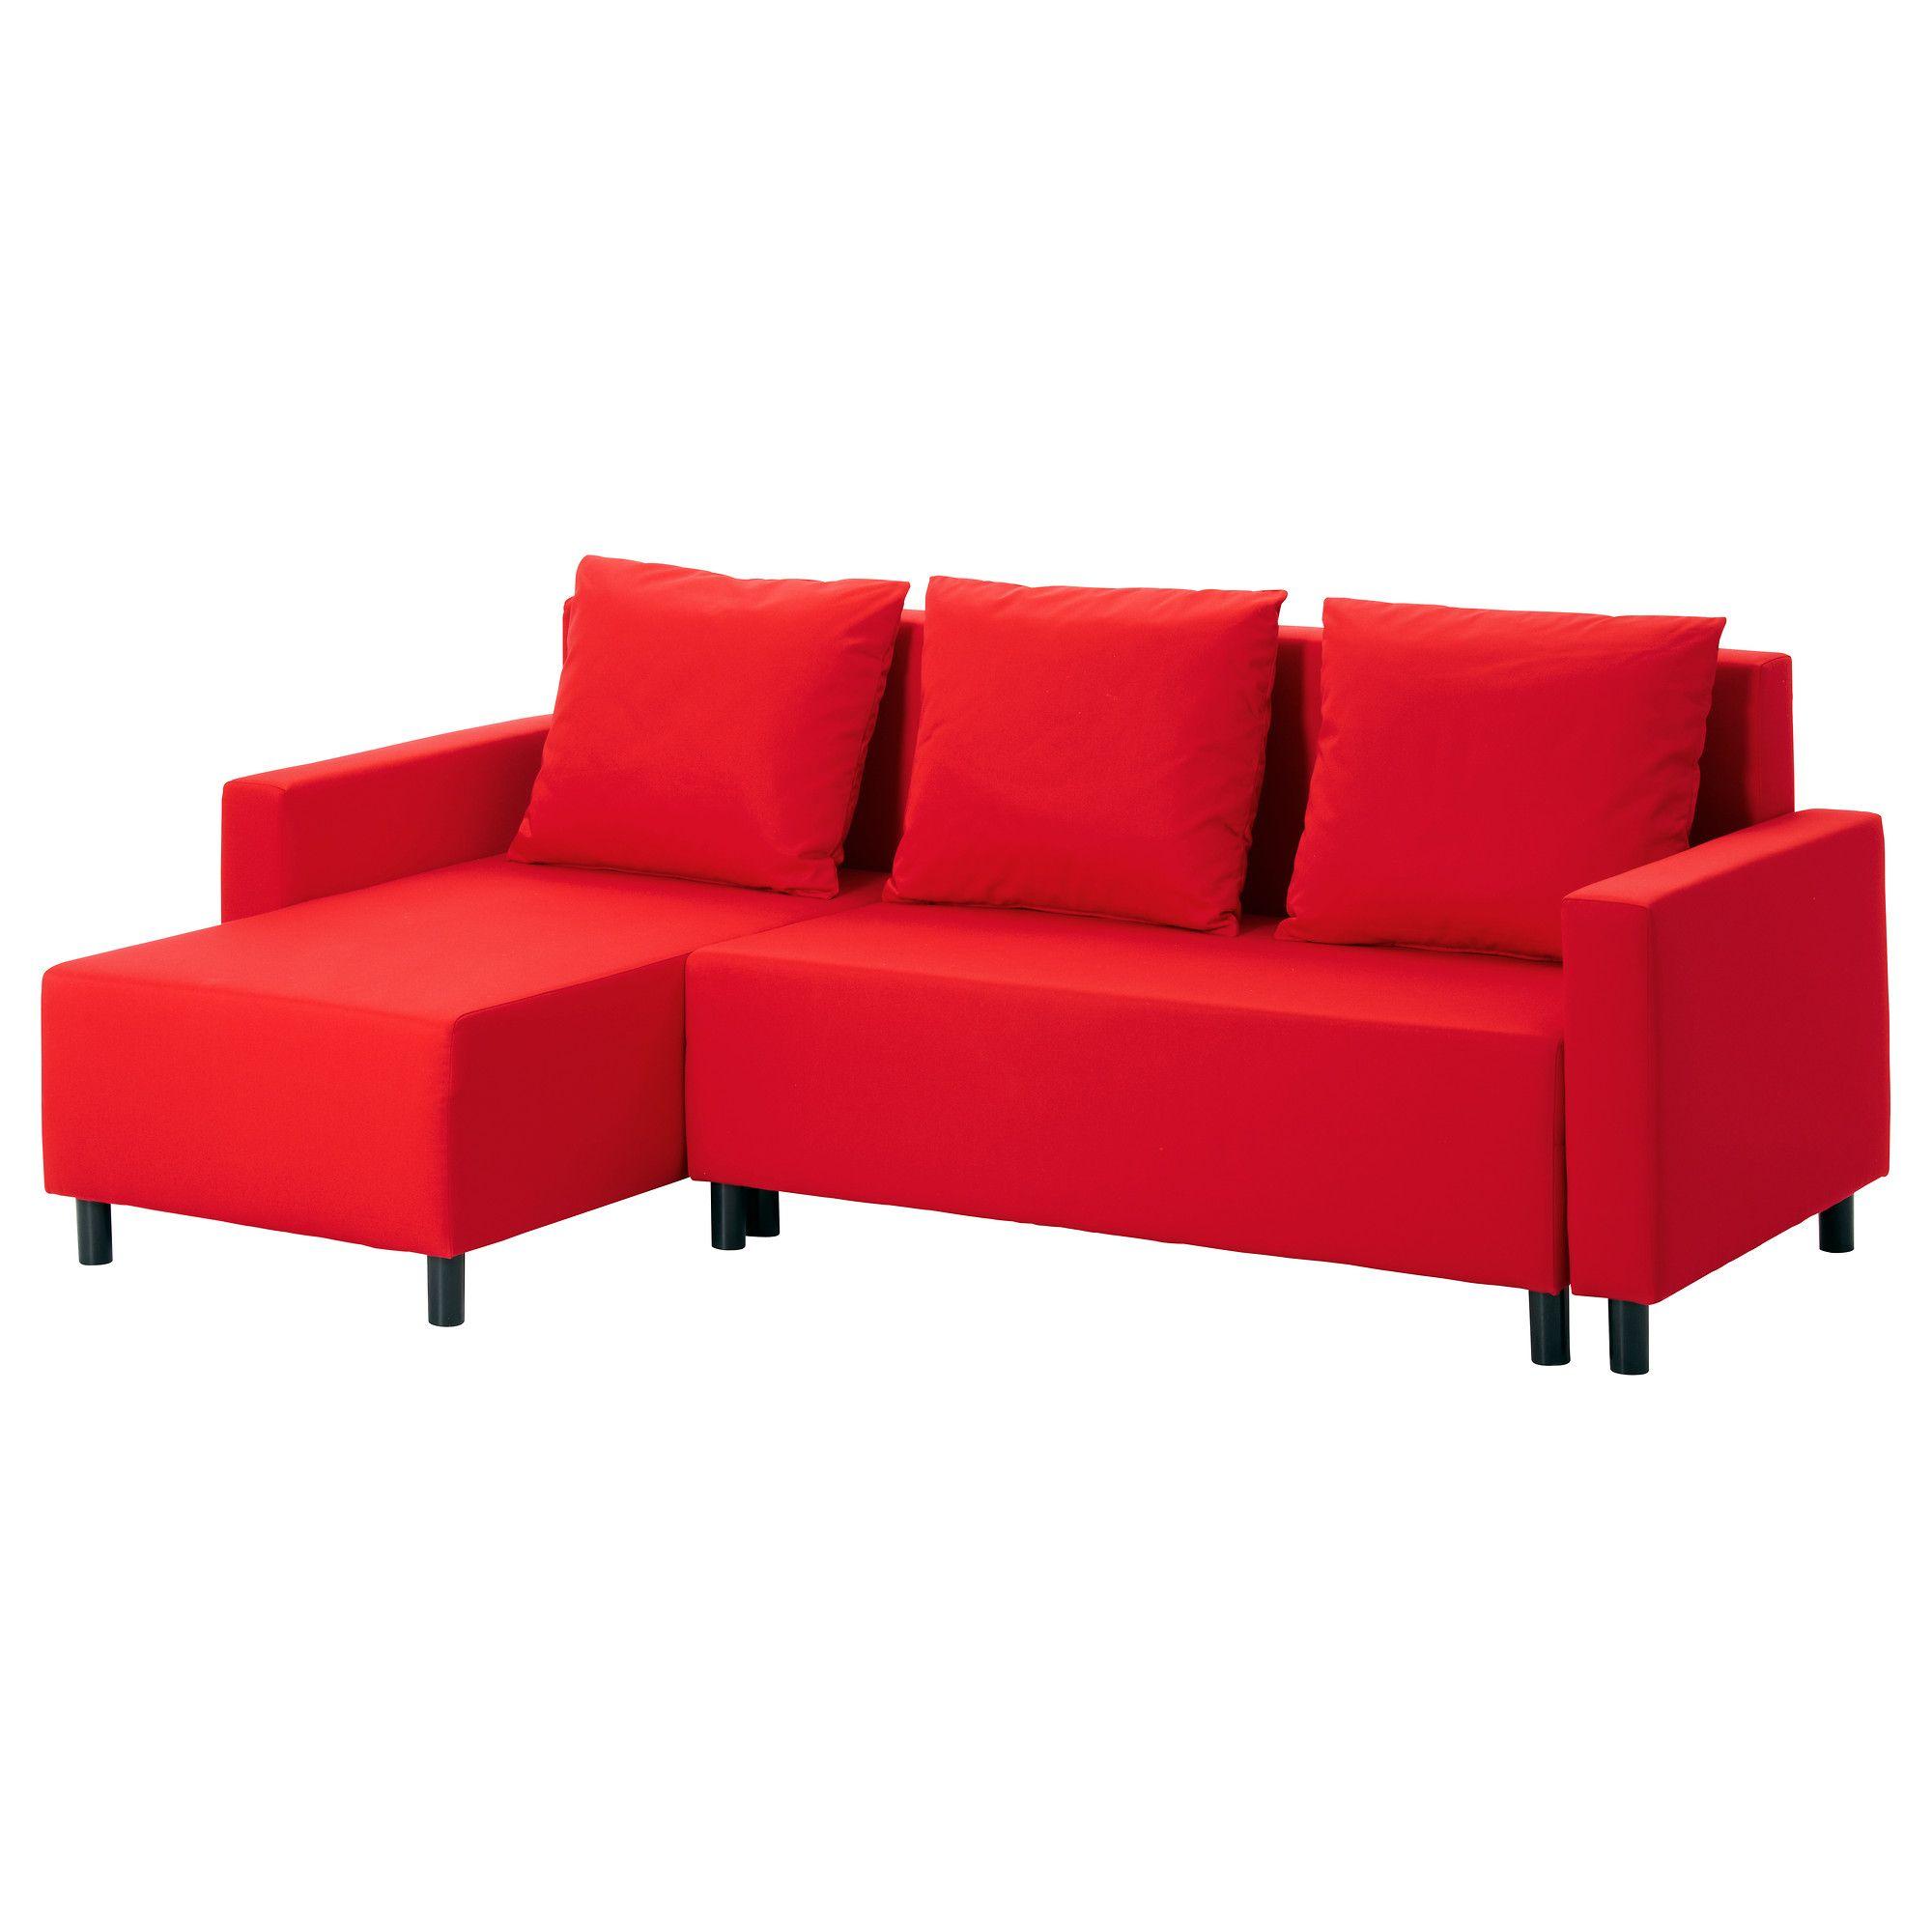 Us Furniture And Home Furnishings Divano Letto Ikea Divano